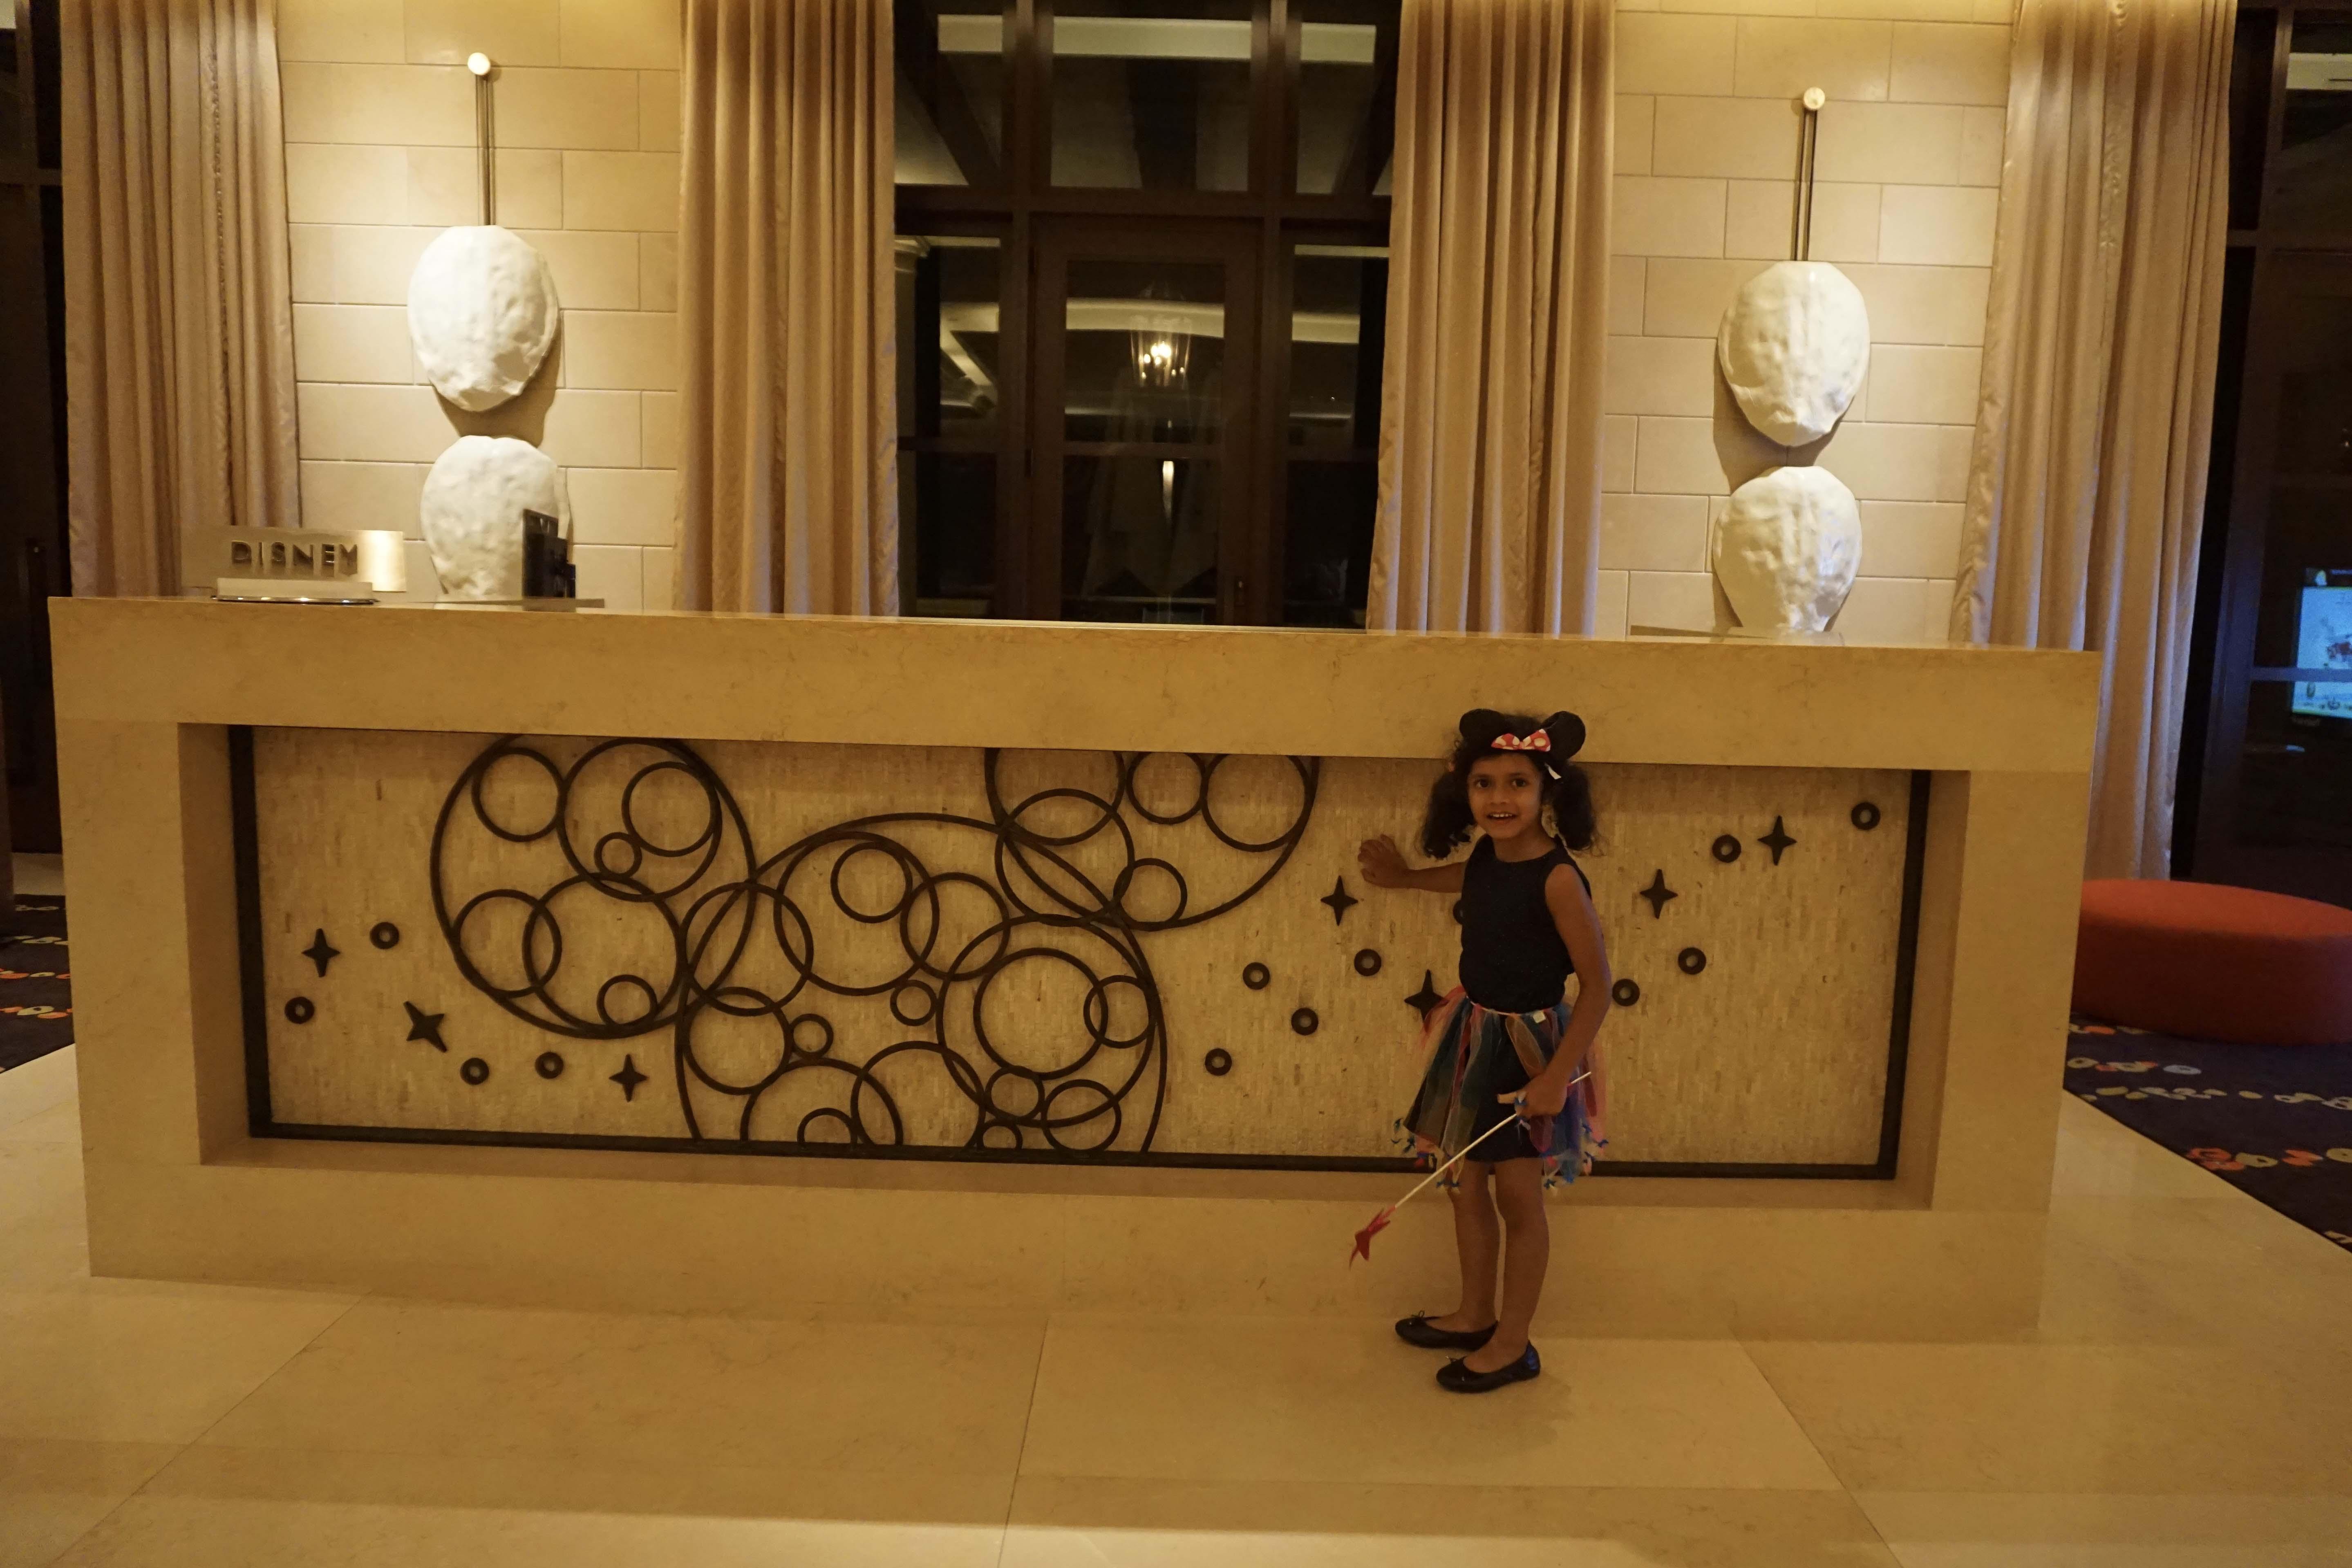 Four Seasons Resort Orlando Review - Outside Suburbia